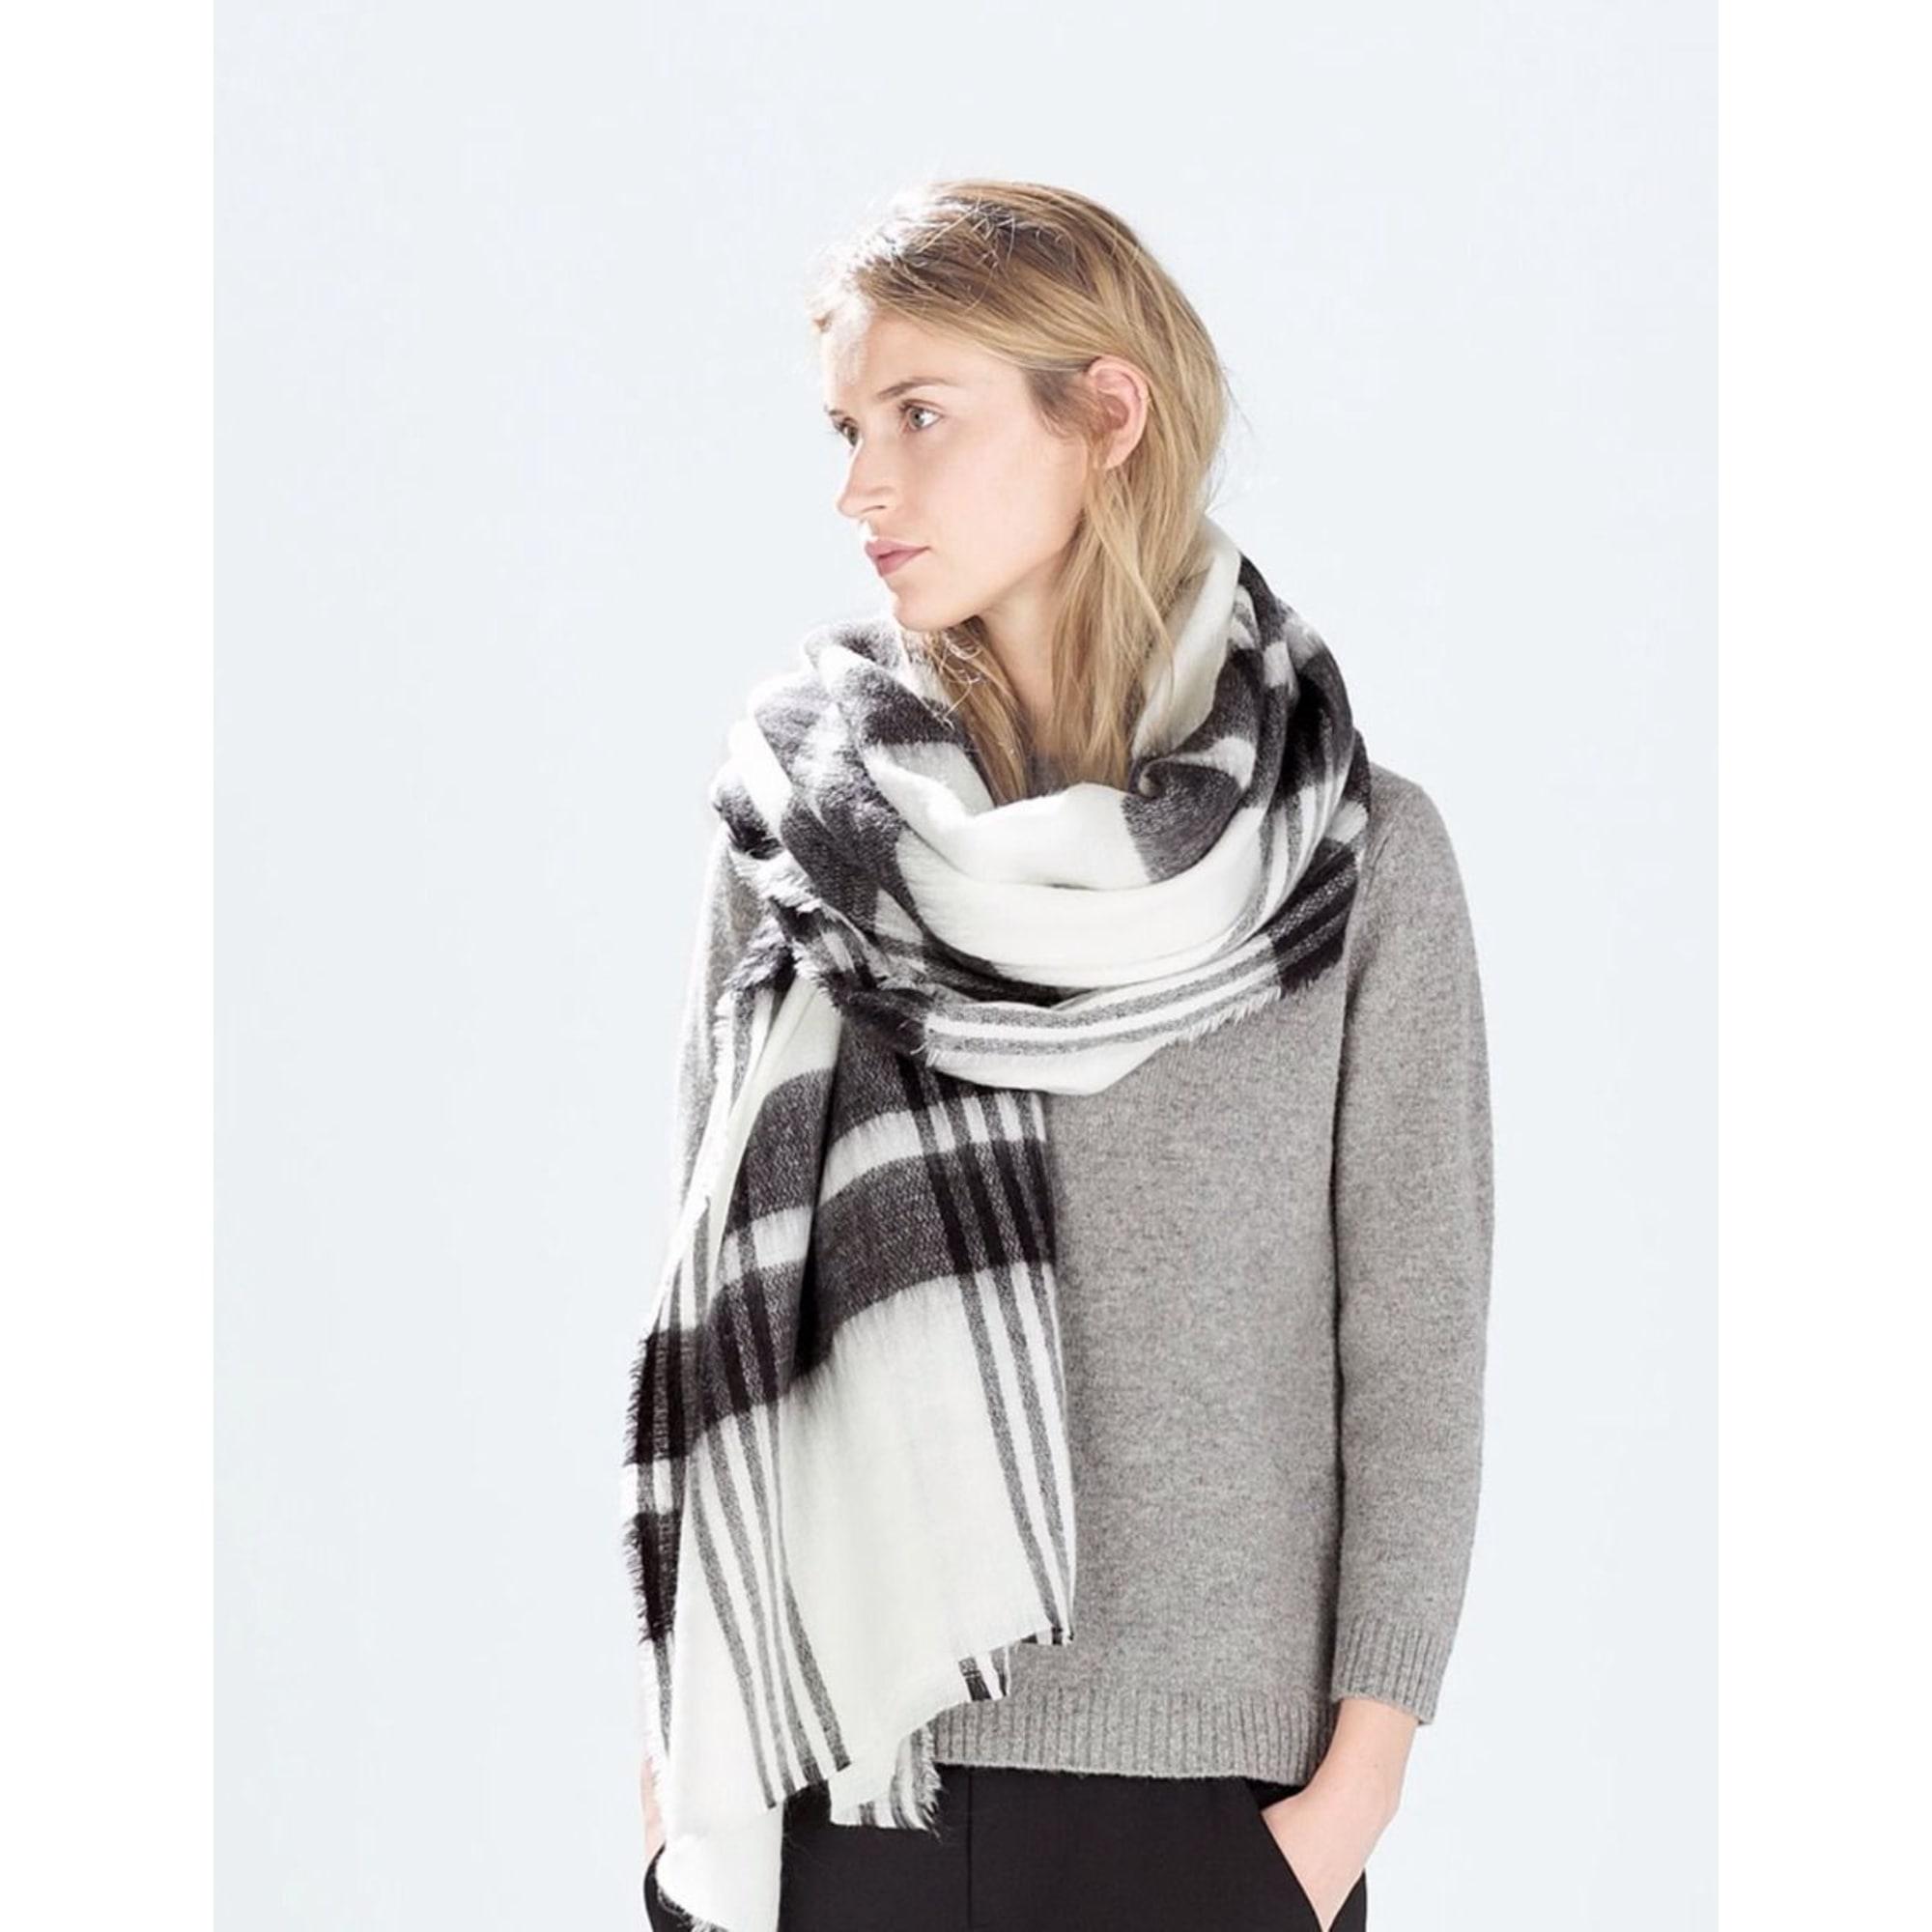 237b5685e81bf Echarpe ZARA blanc vendu par Julie dressing shop - 3052492